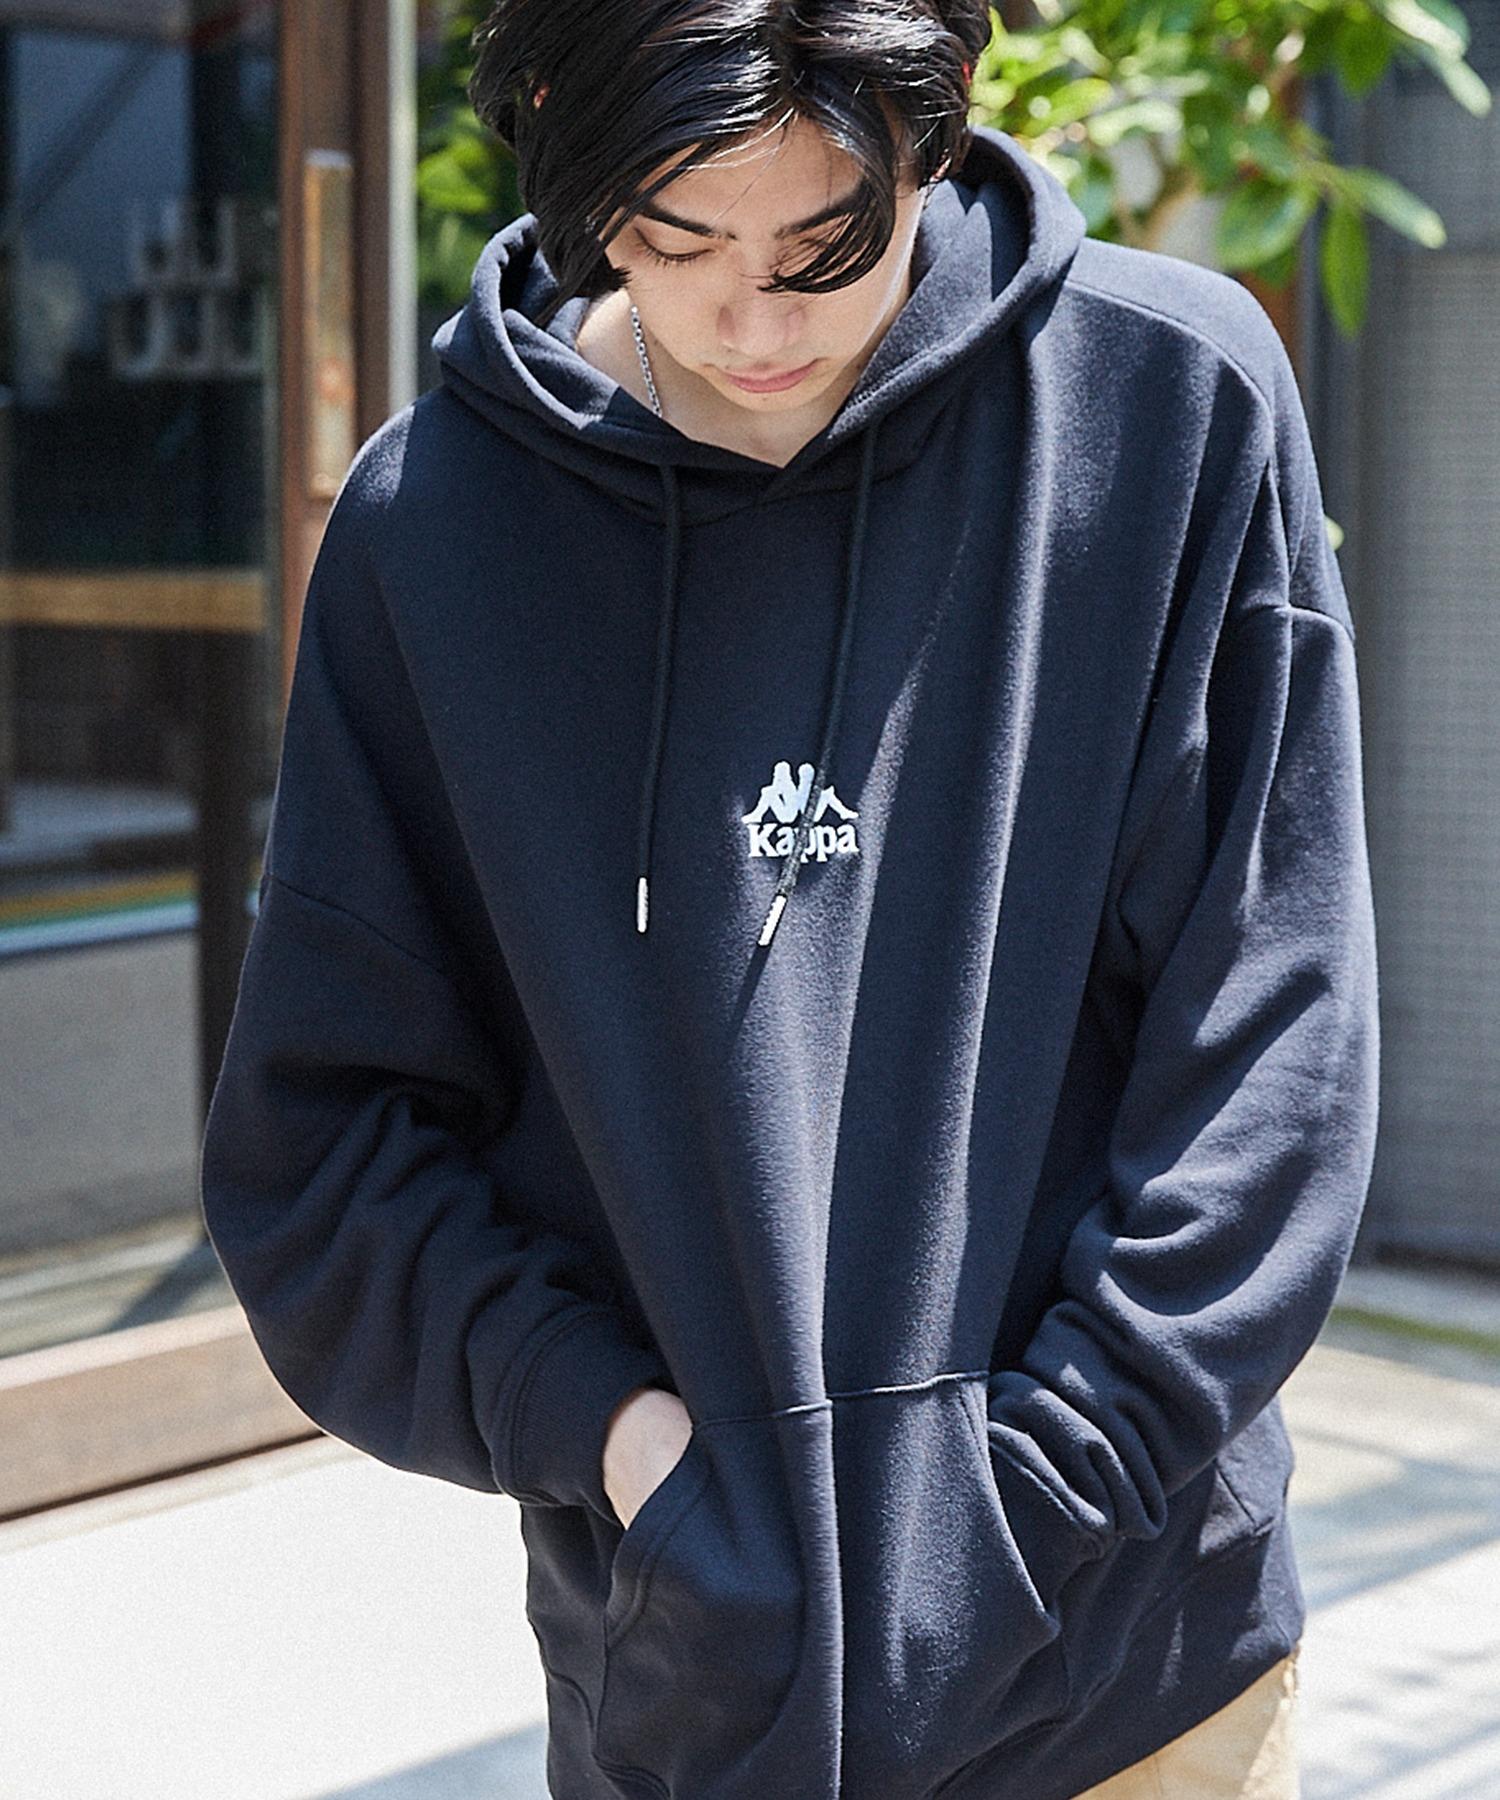 ▽WEB限定 Kappa/カッパ 別注ロゴ刺繍 ビッグシルエット プルオーバーパーカー